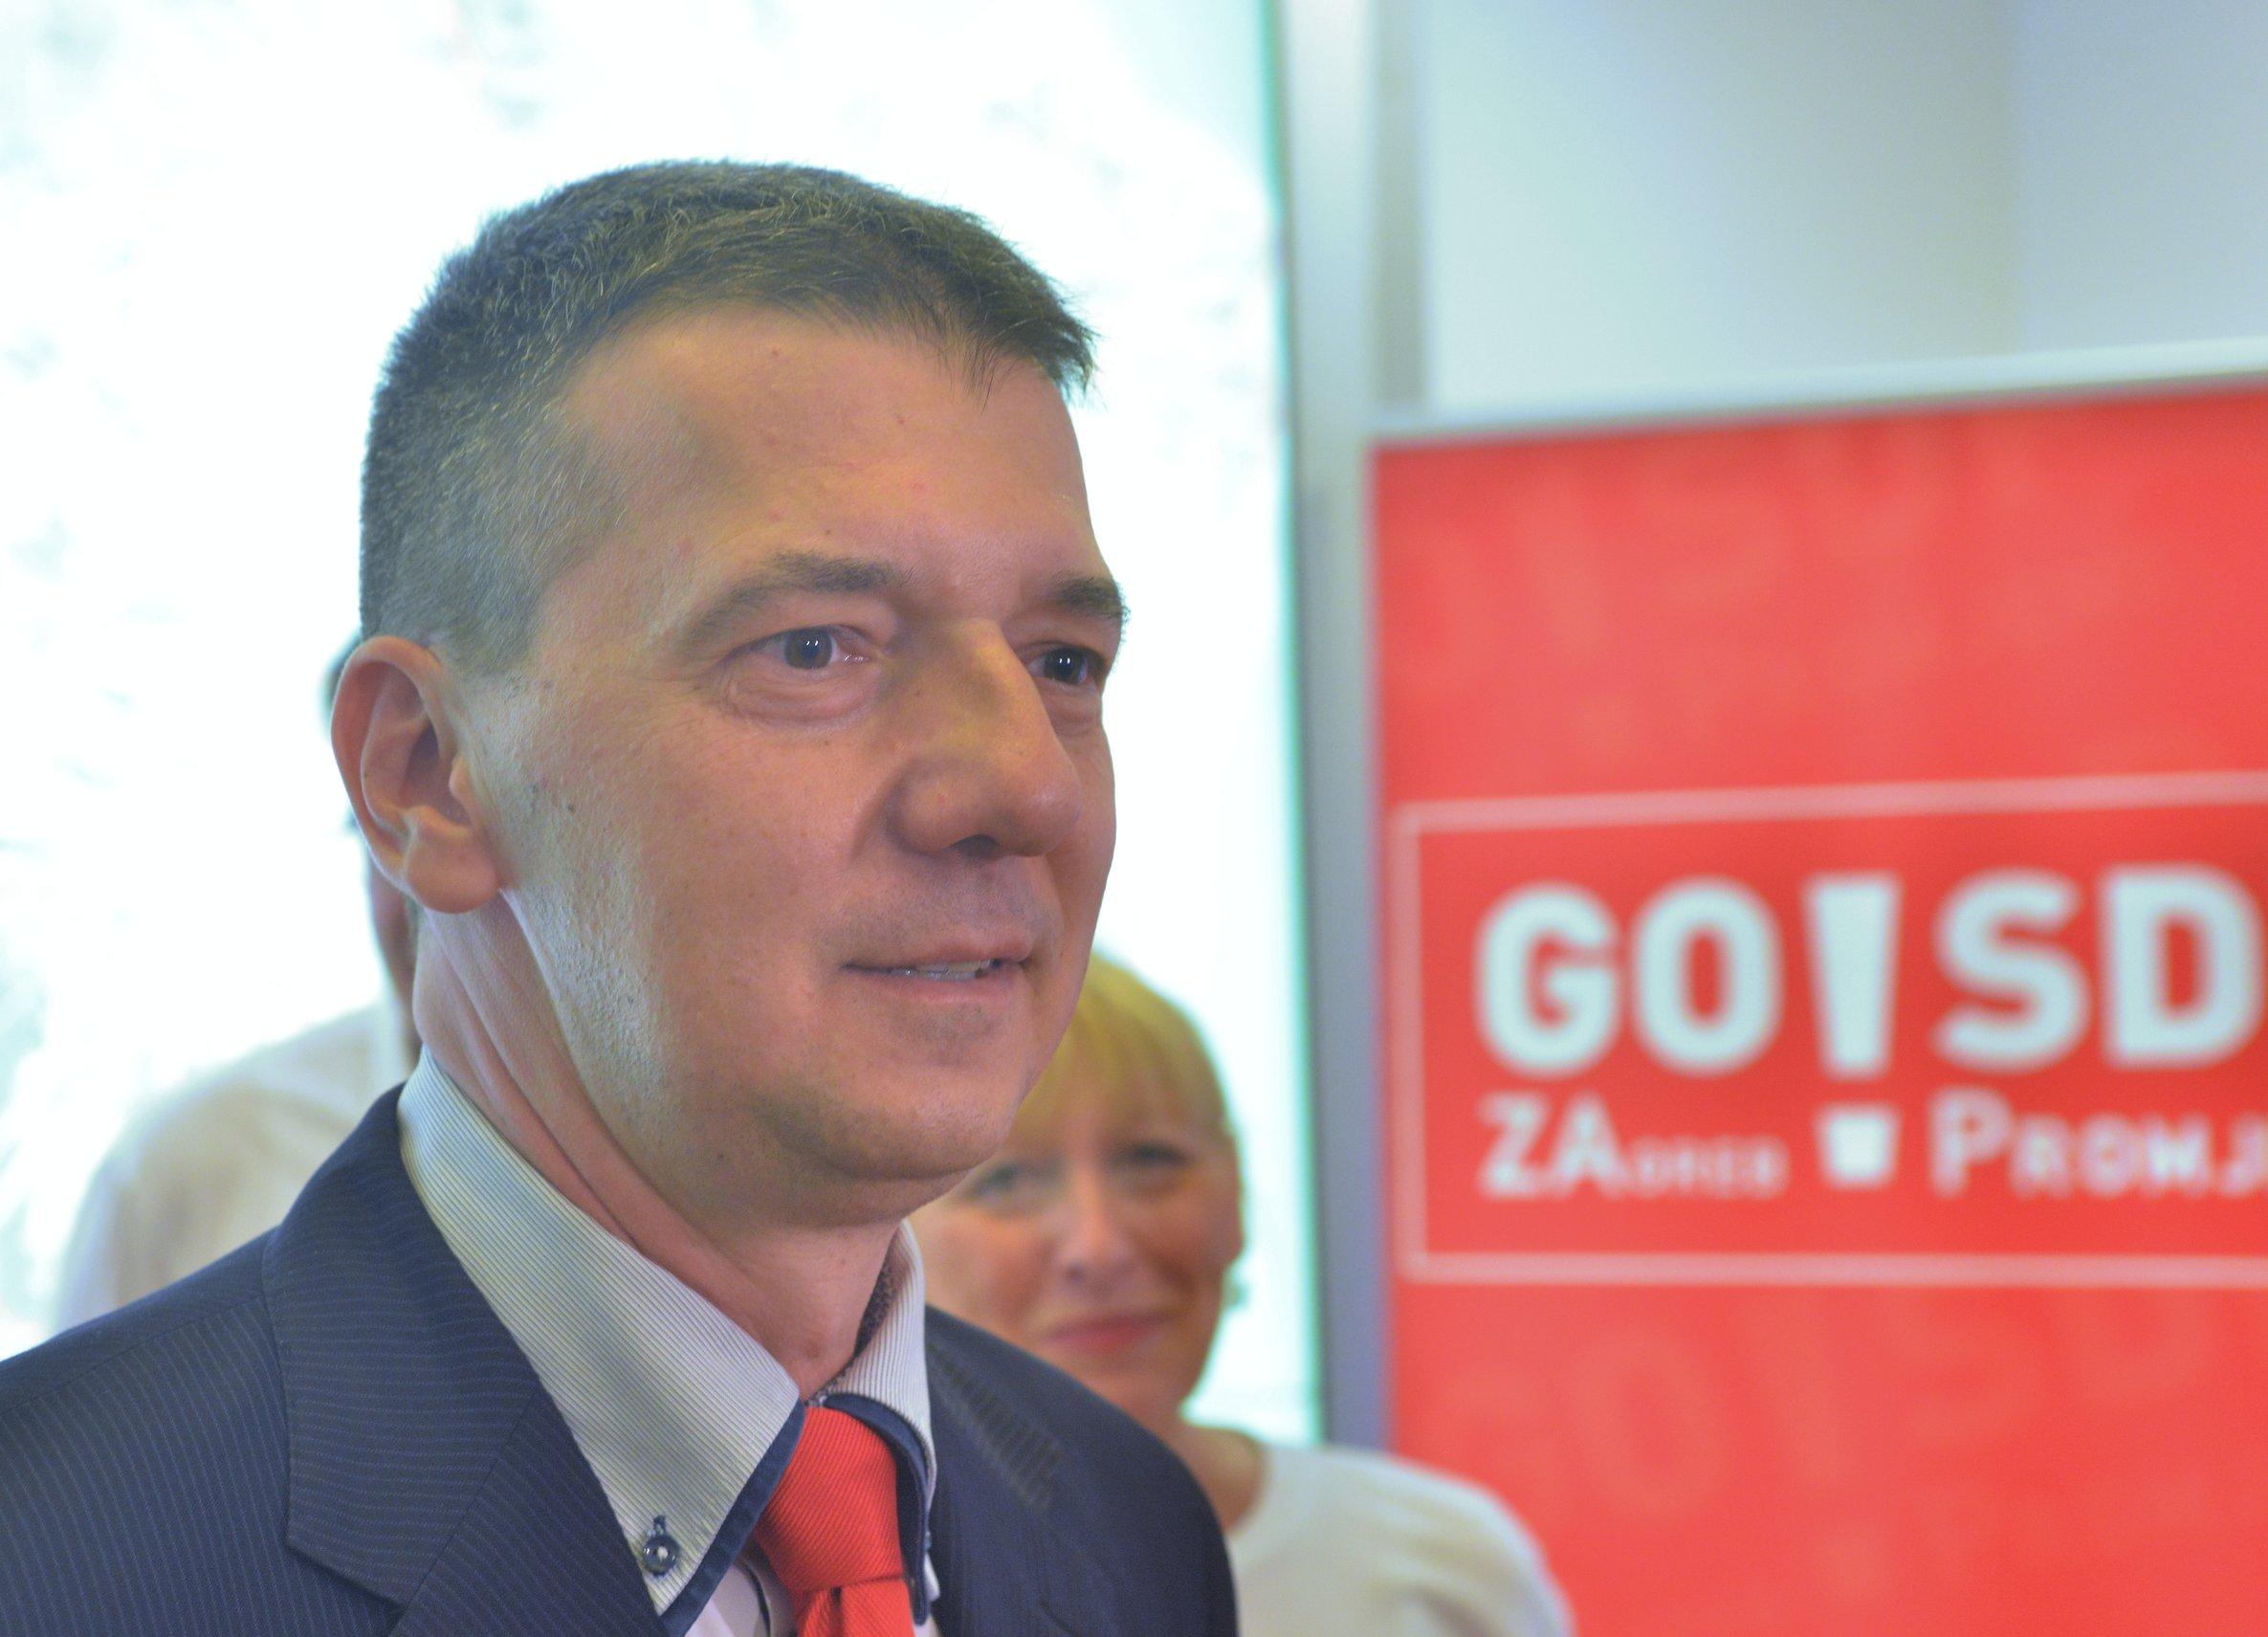 Hrestak glasao i opovrgnuo da je kandidat šefa stranke